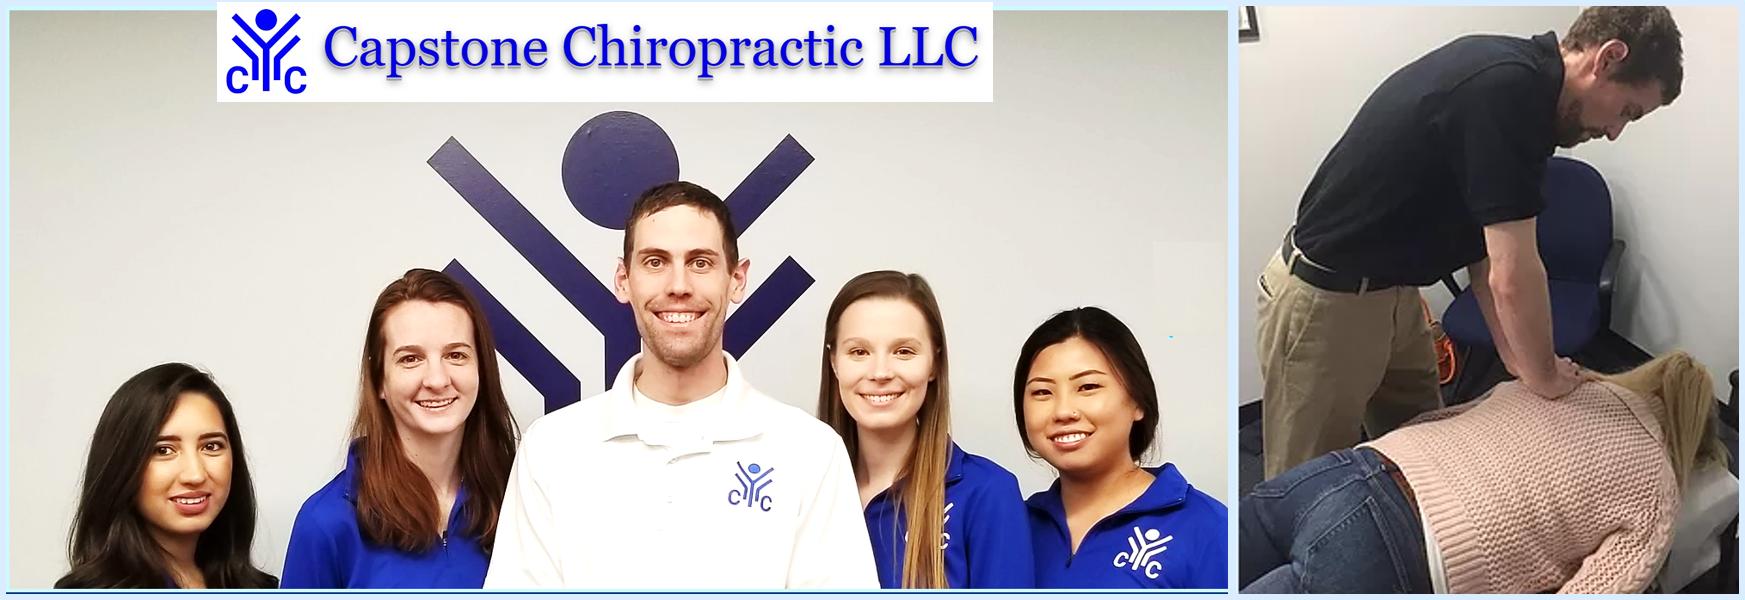 Capstone Chiropractic LLC reviews | Chiropractors at 2579 John Milton Dr #220 - Herndon VA